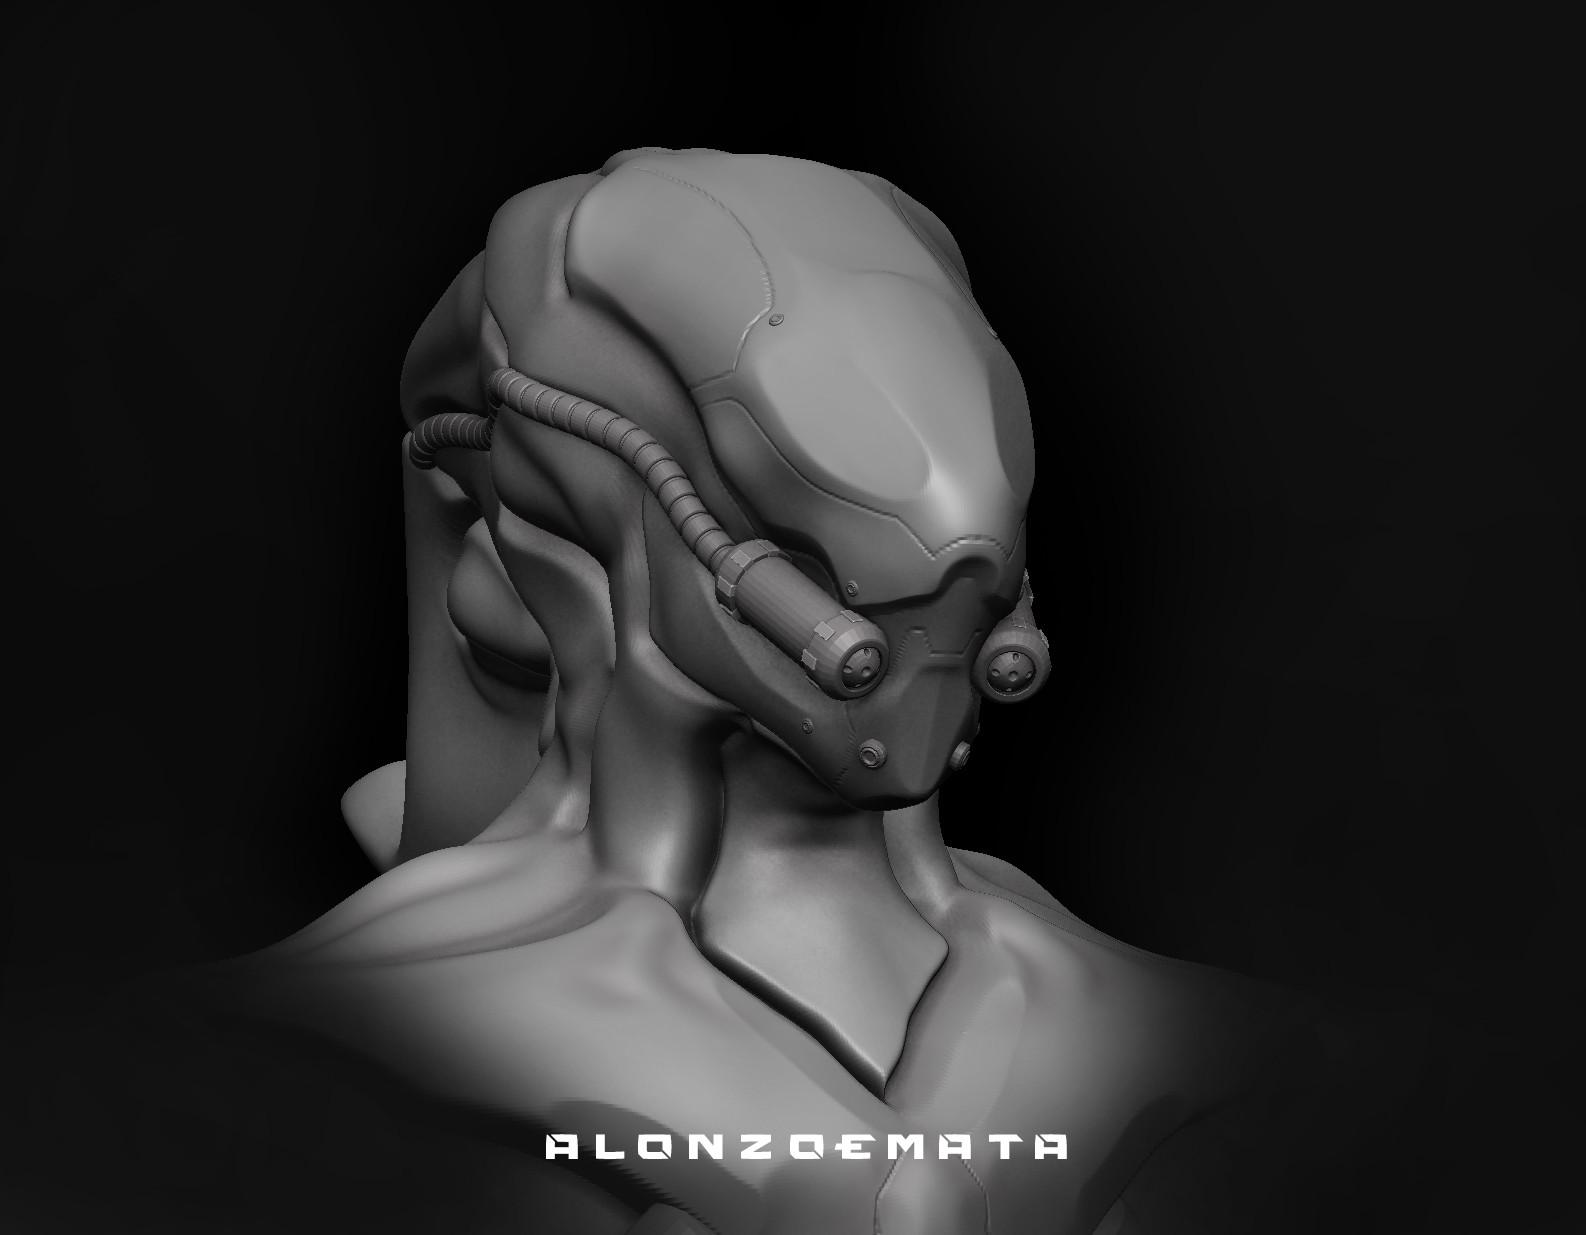 Alonzo emata xeno helmet